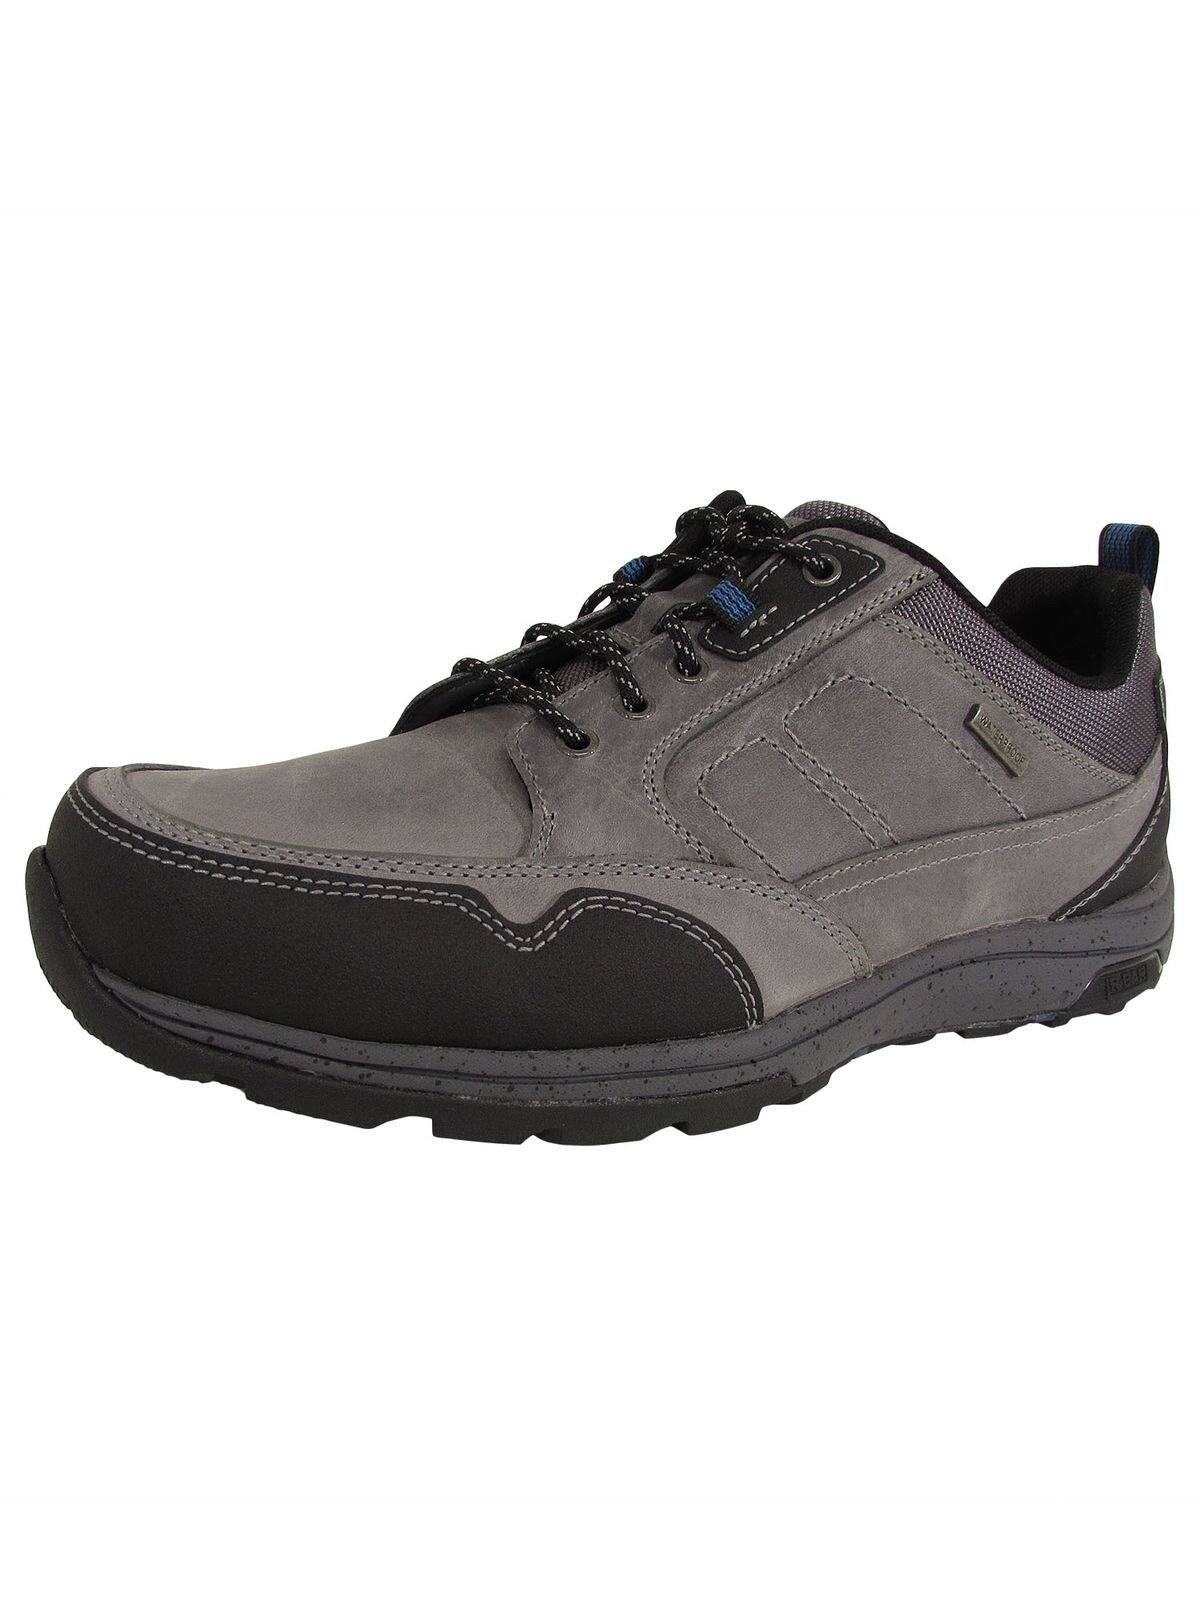 c280b2aec27 $130 Retail Dunham Mens Trukka Mudguard Waterproof Oxford Shoes ...